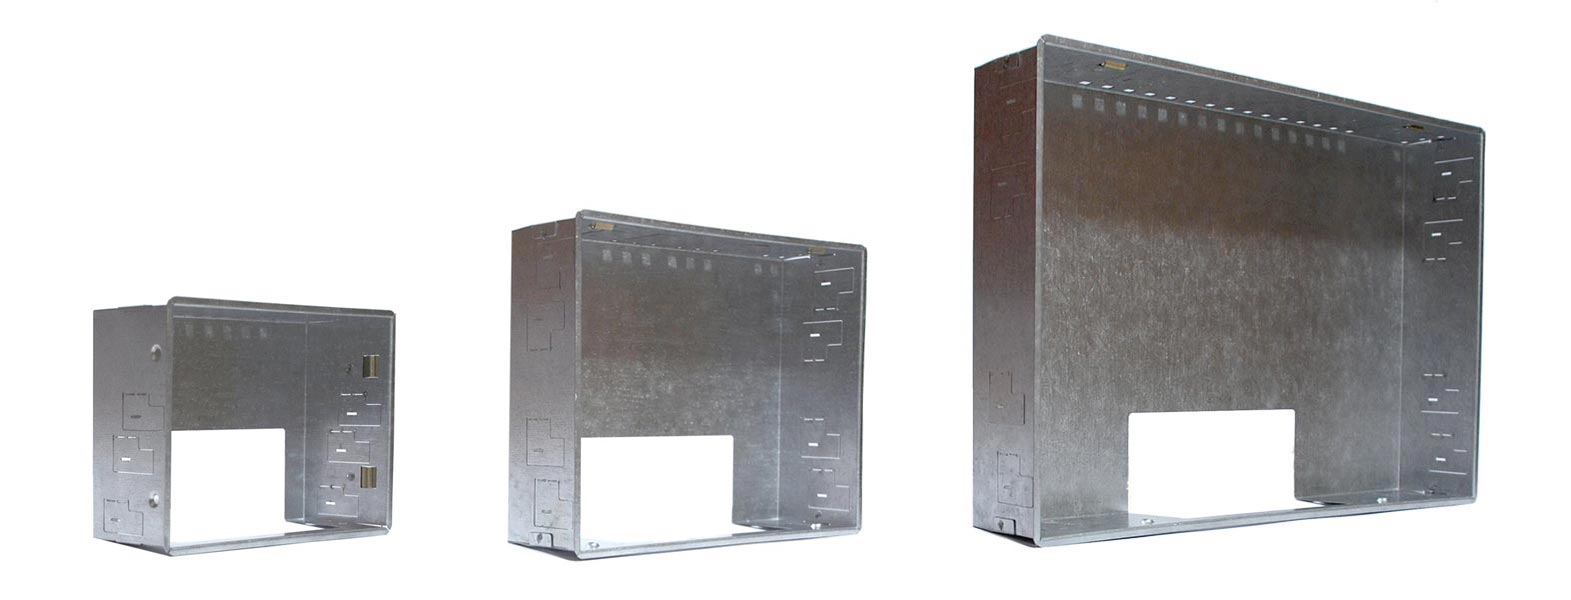 eSMART Box